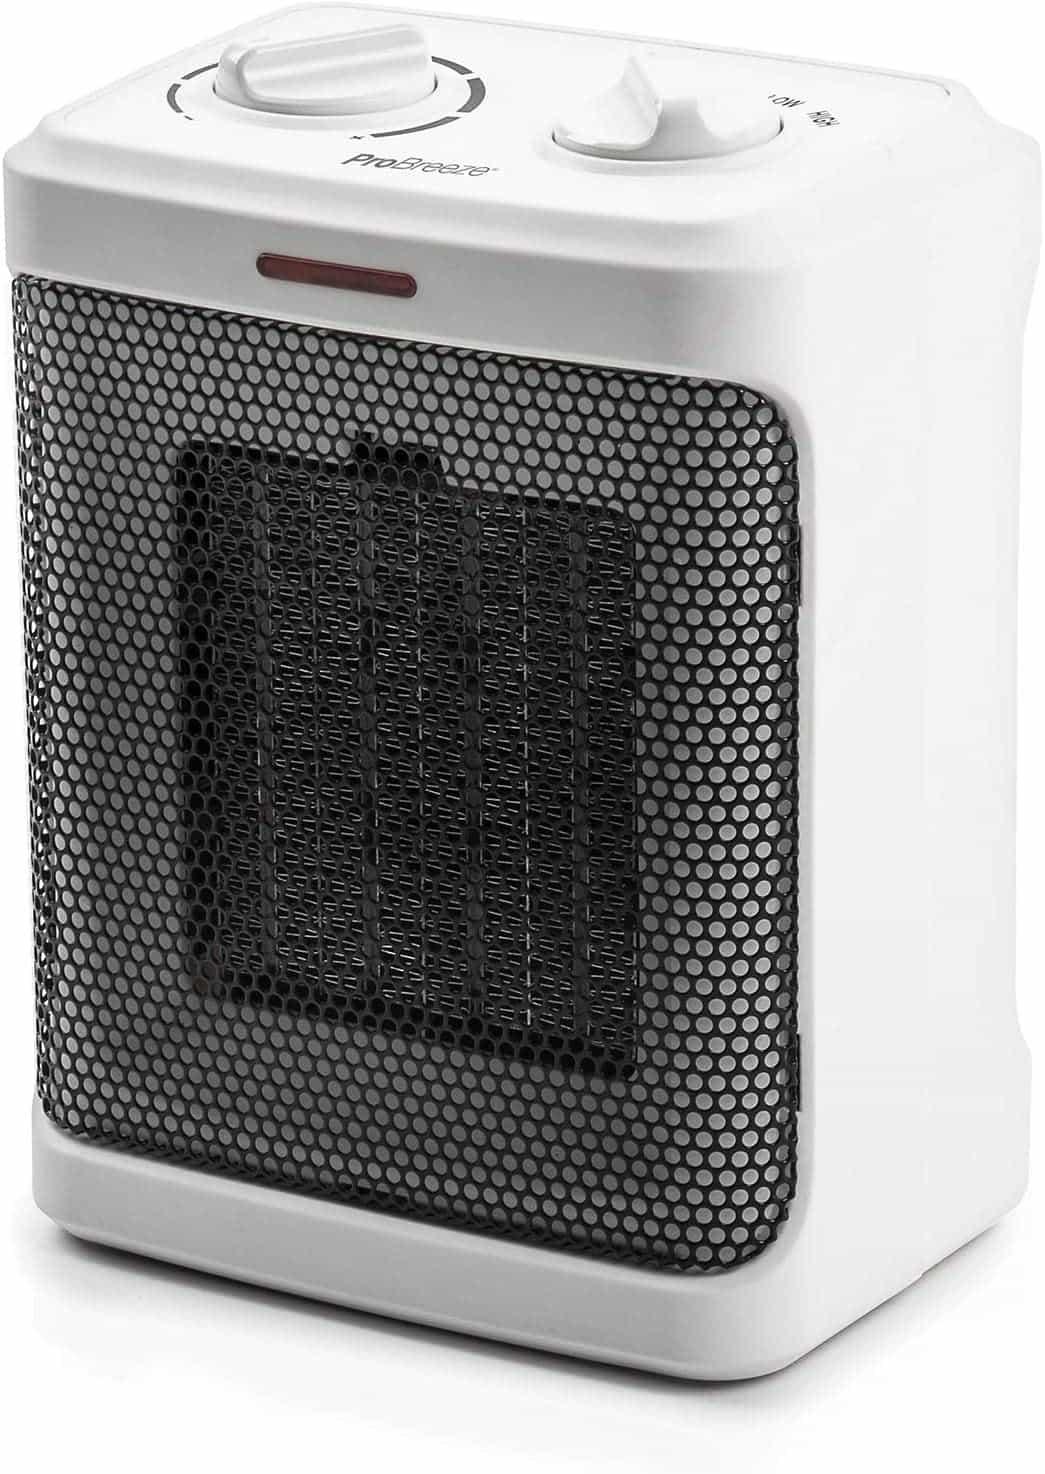 Pro Breeze Energy Saving Under Desk Space Heater